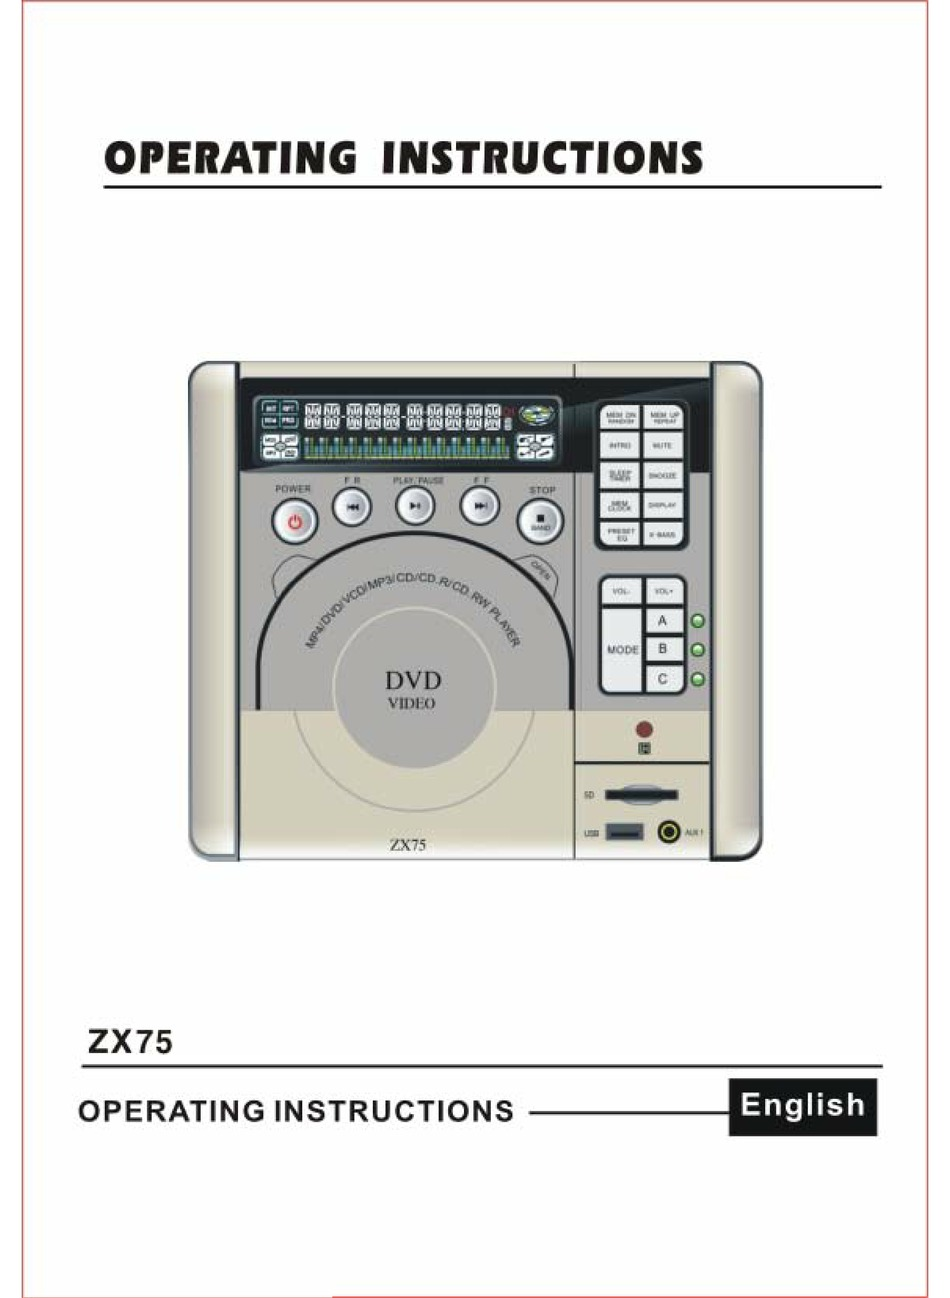 CONCERTONE ZX75 OPERATING INSTRUCTIONS MANUAL Pdf Download   ManualsLib   Concertone Wiring Diagram      ManualsLib